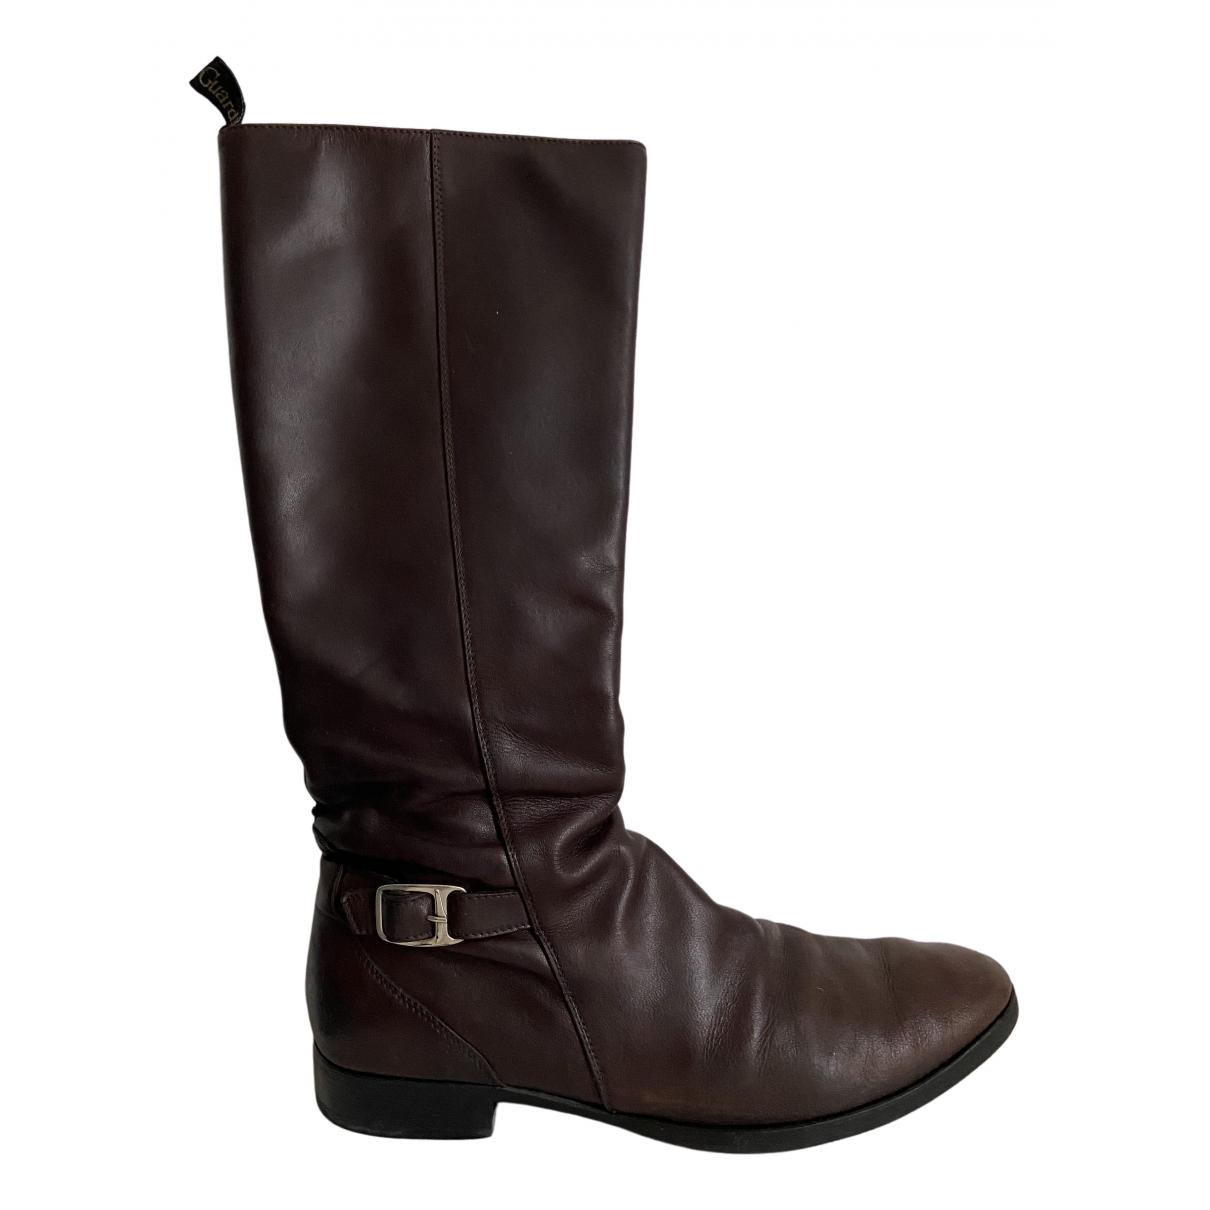 Alberto Guardiani N Brown Leather Boots for Women 39 EU